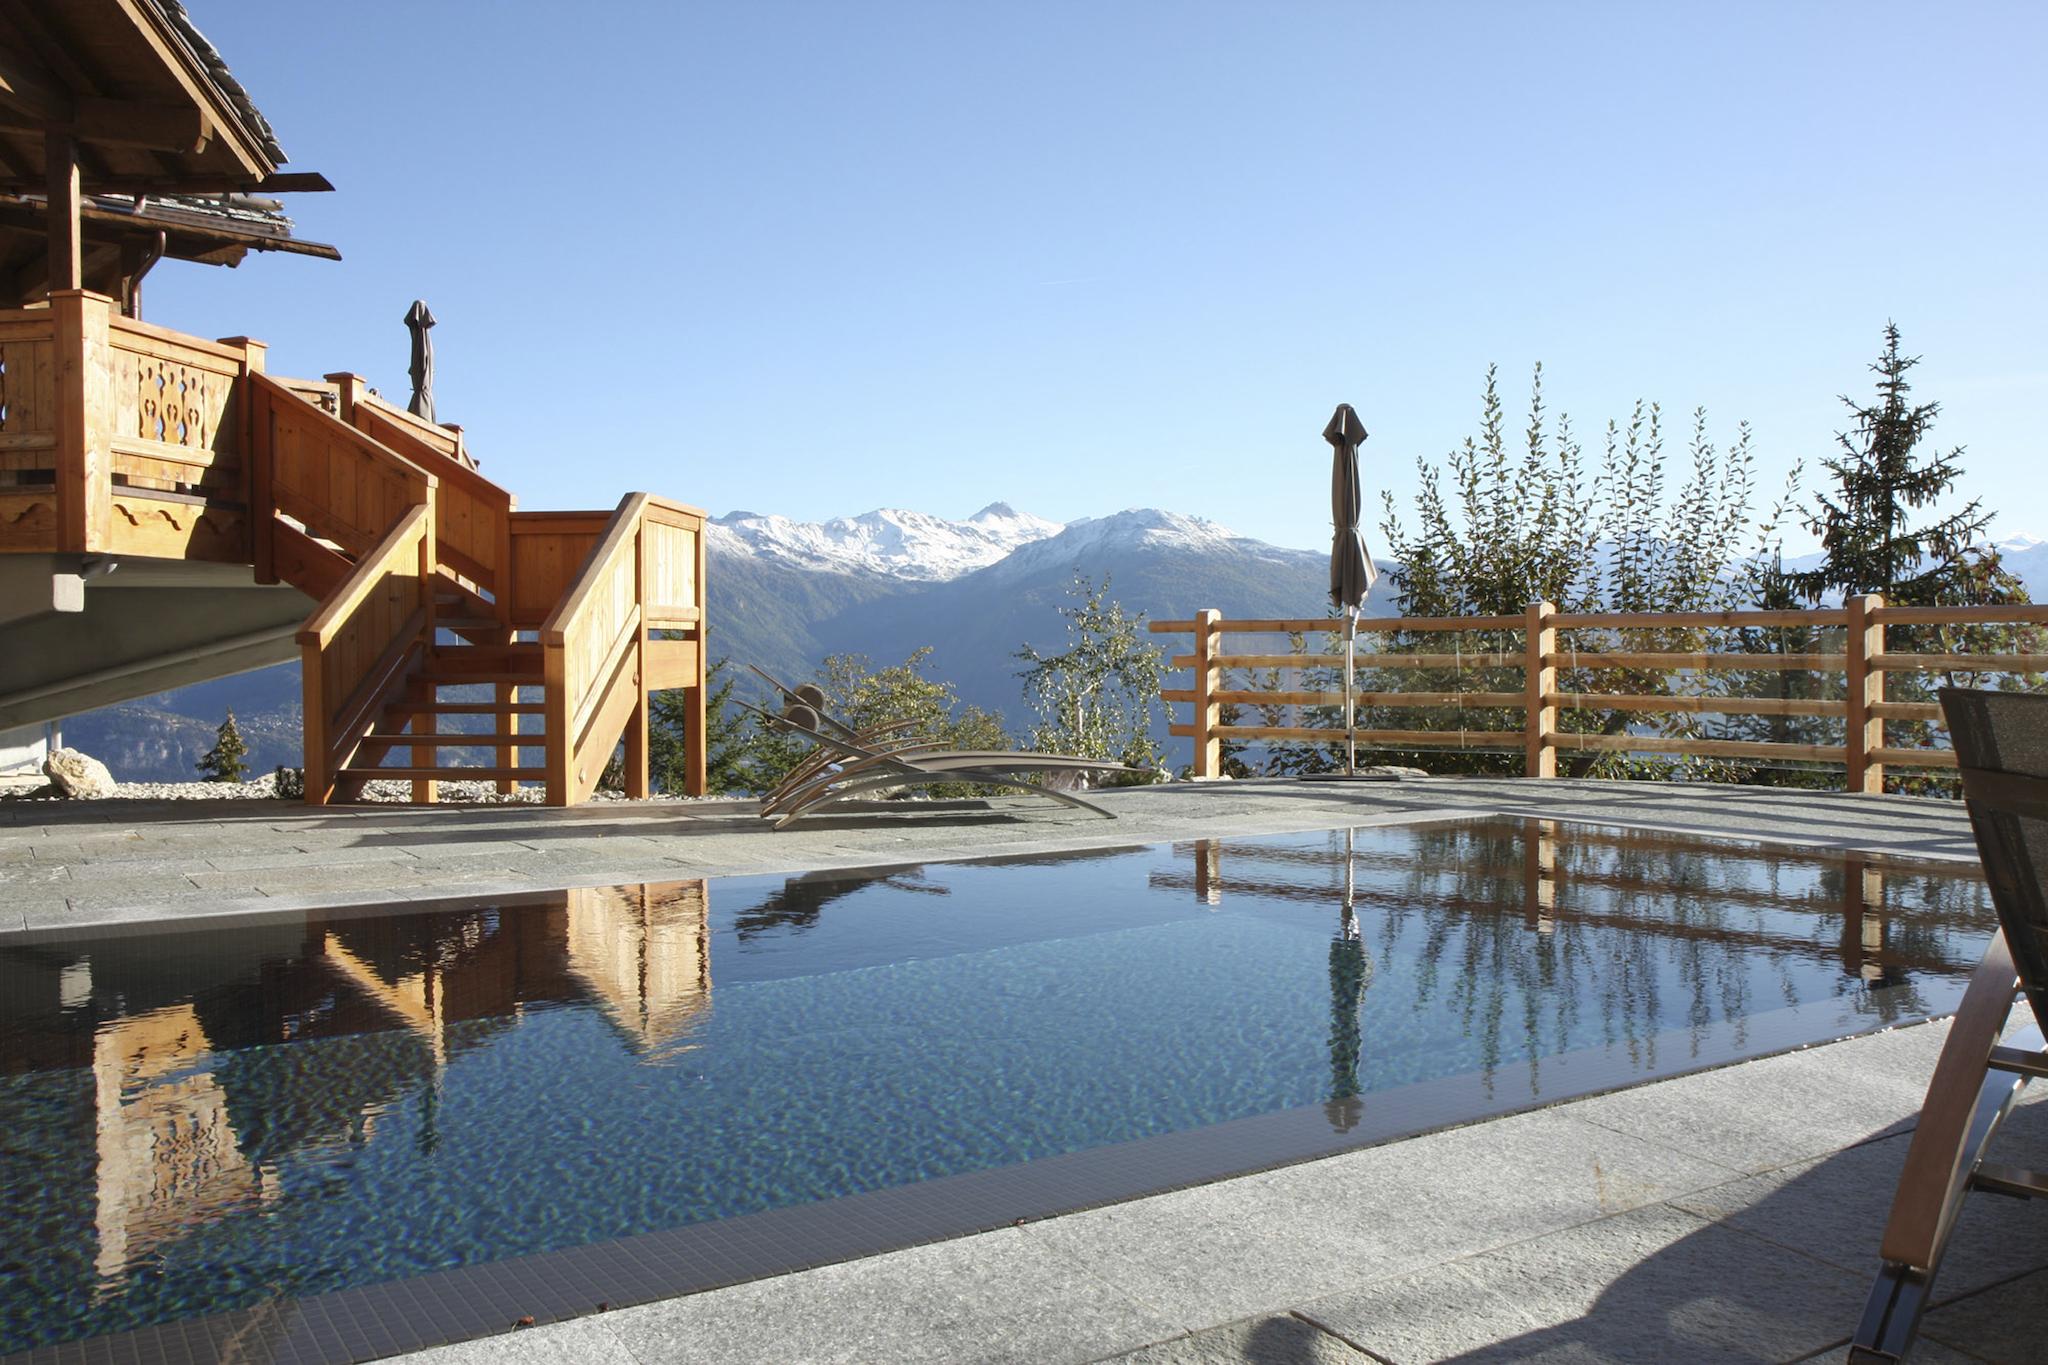 An outdoor pool at LeCrans Hotel, Switzerland.